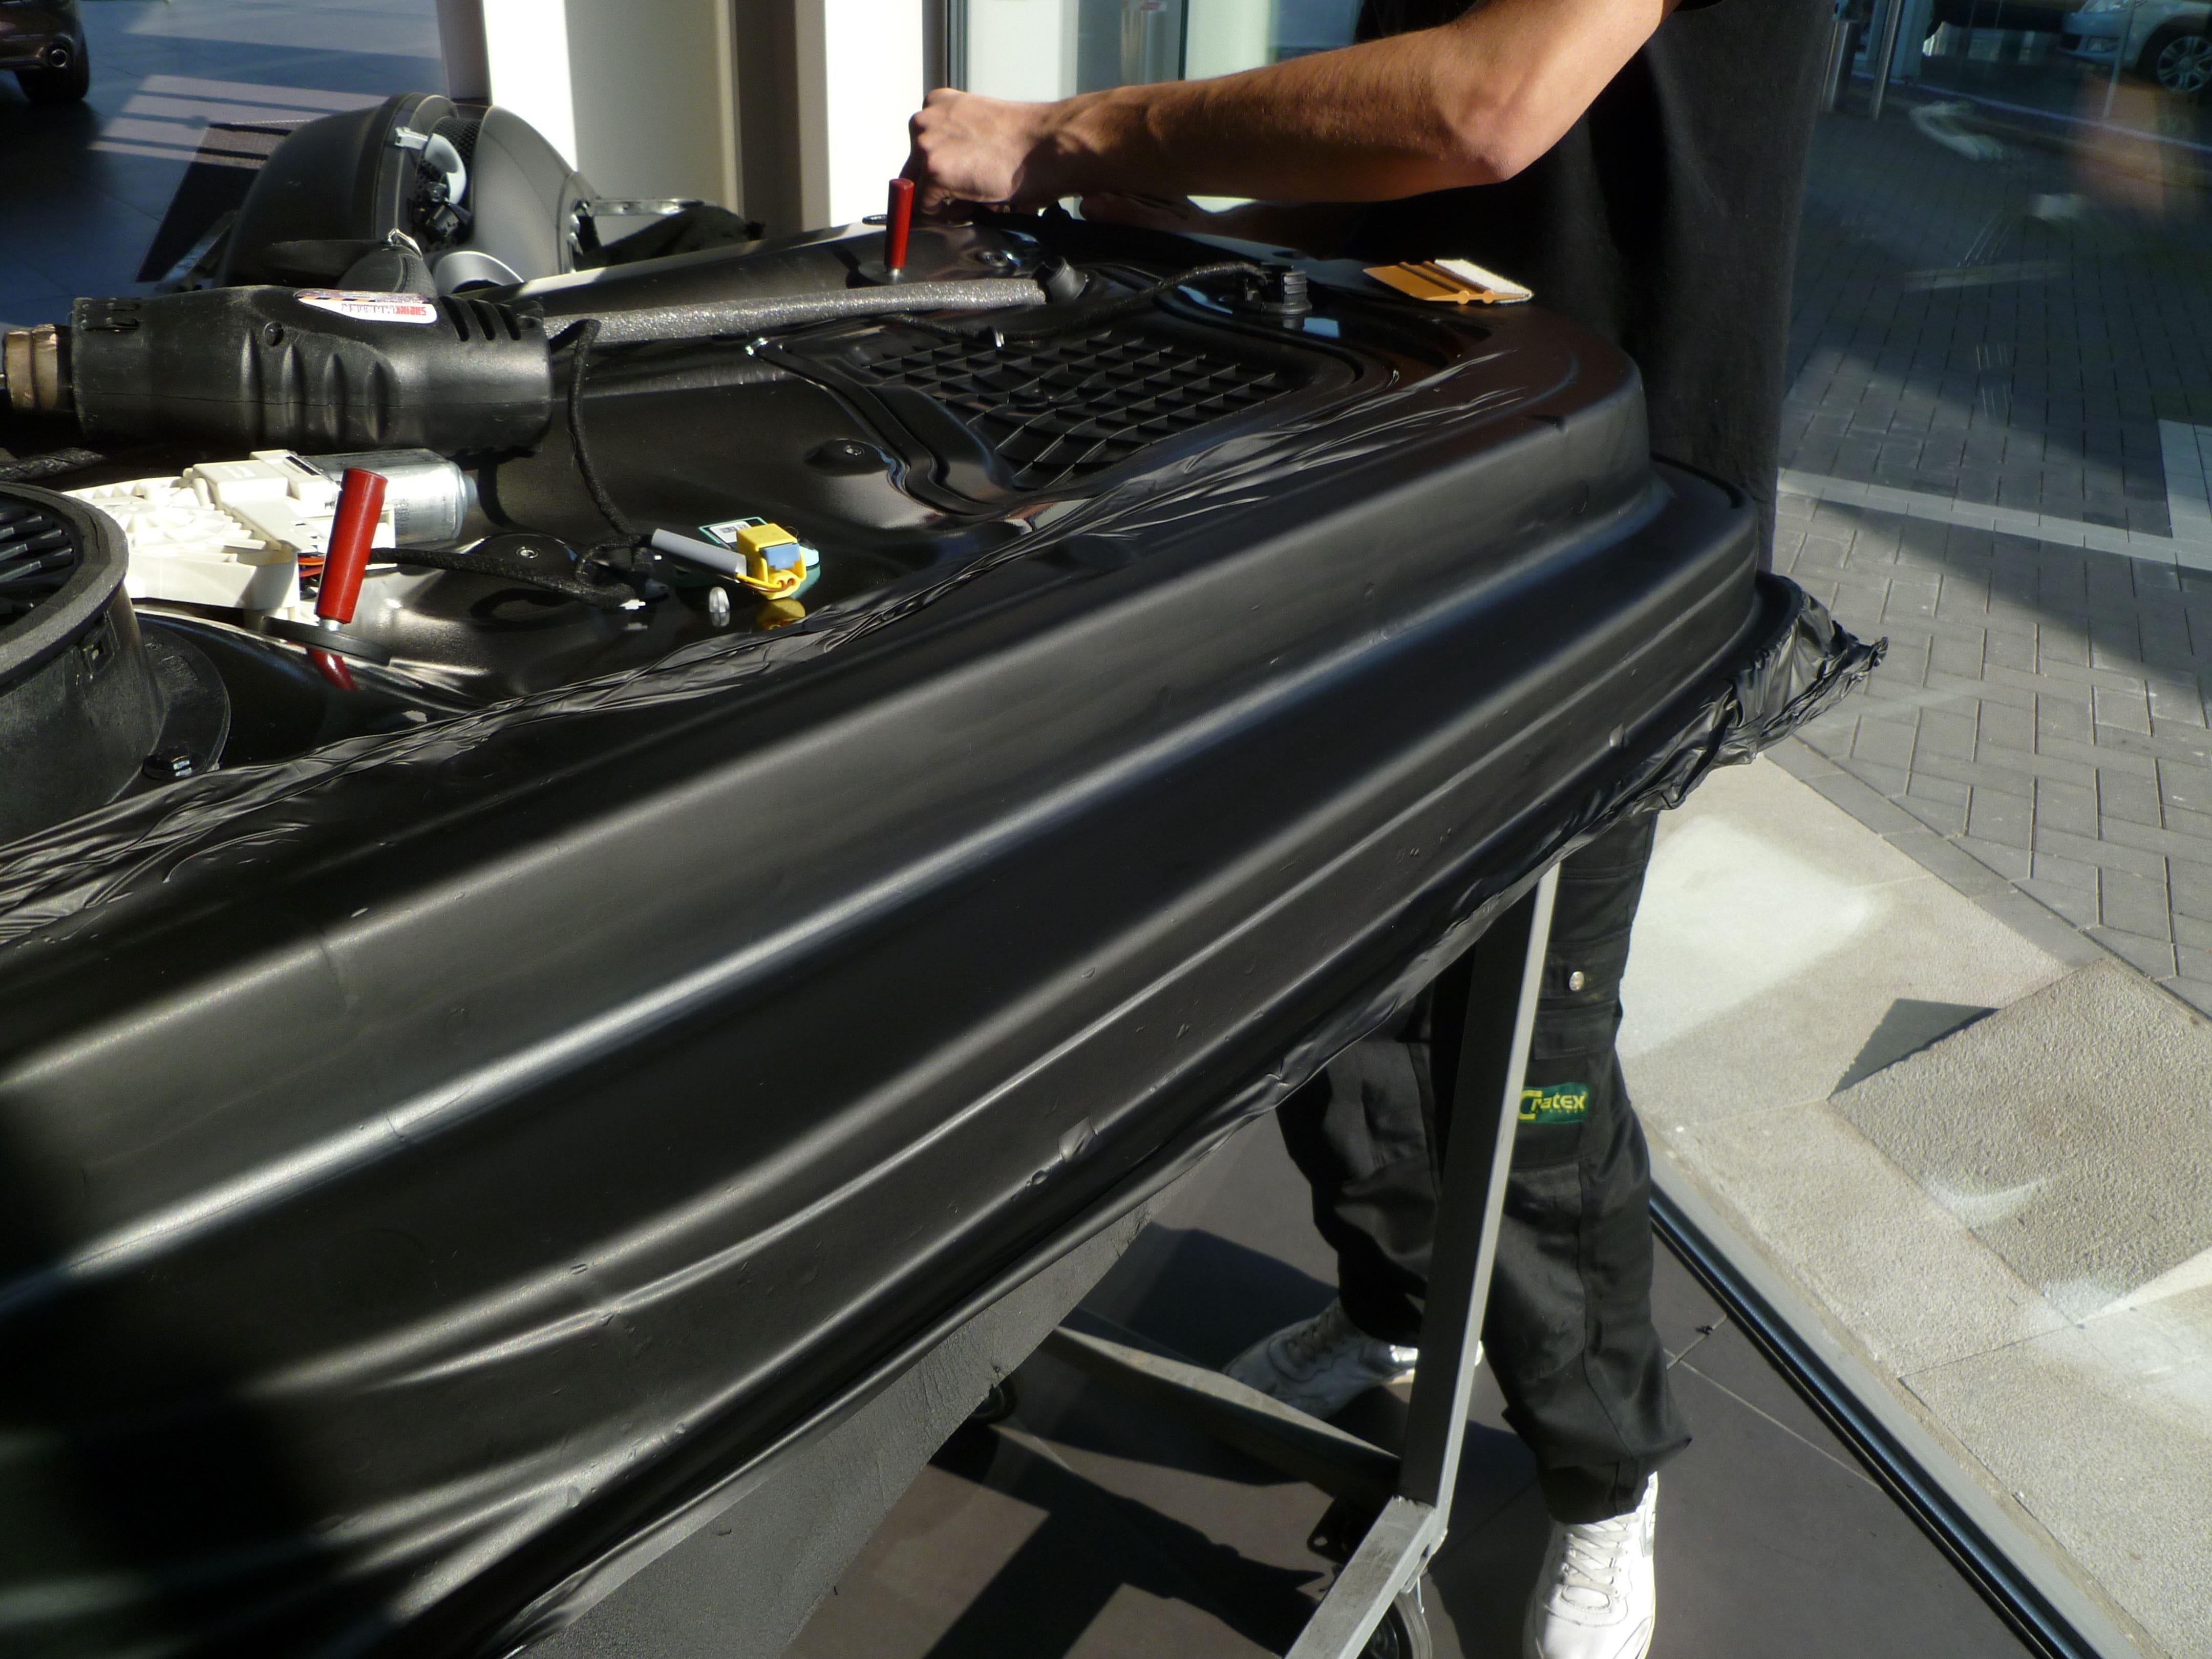 Audi A5 Coupe met Mat Zwarte Wrap, Carwrapping door Wrapmyride.nu Foto-nr:4634, ©2021